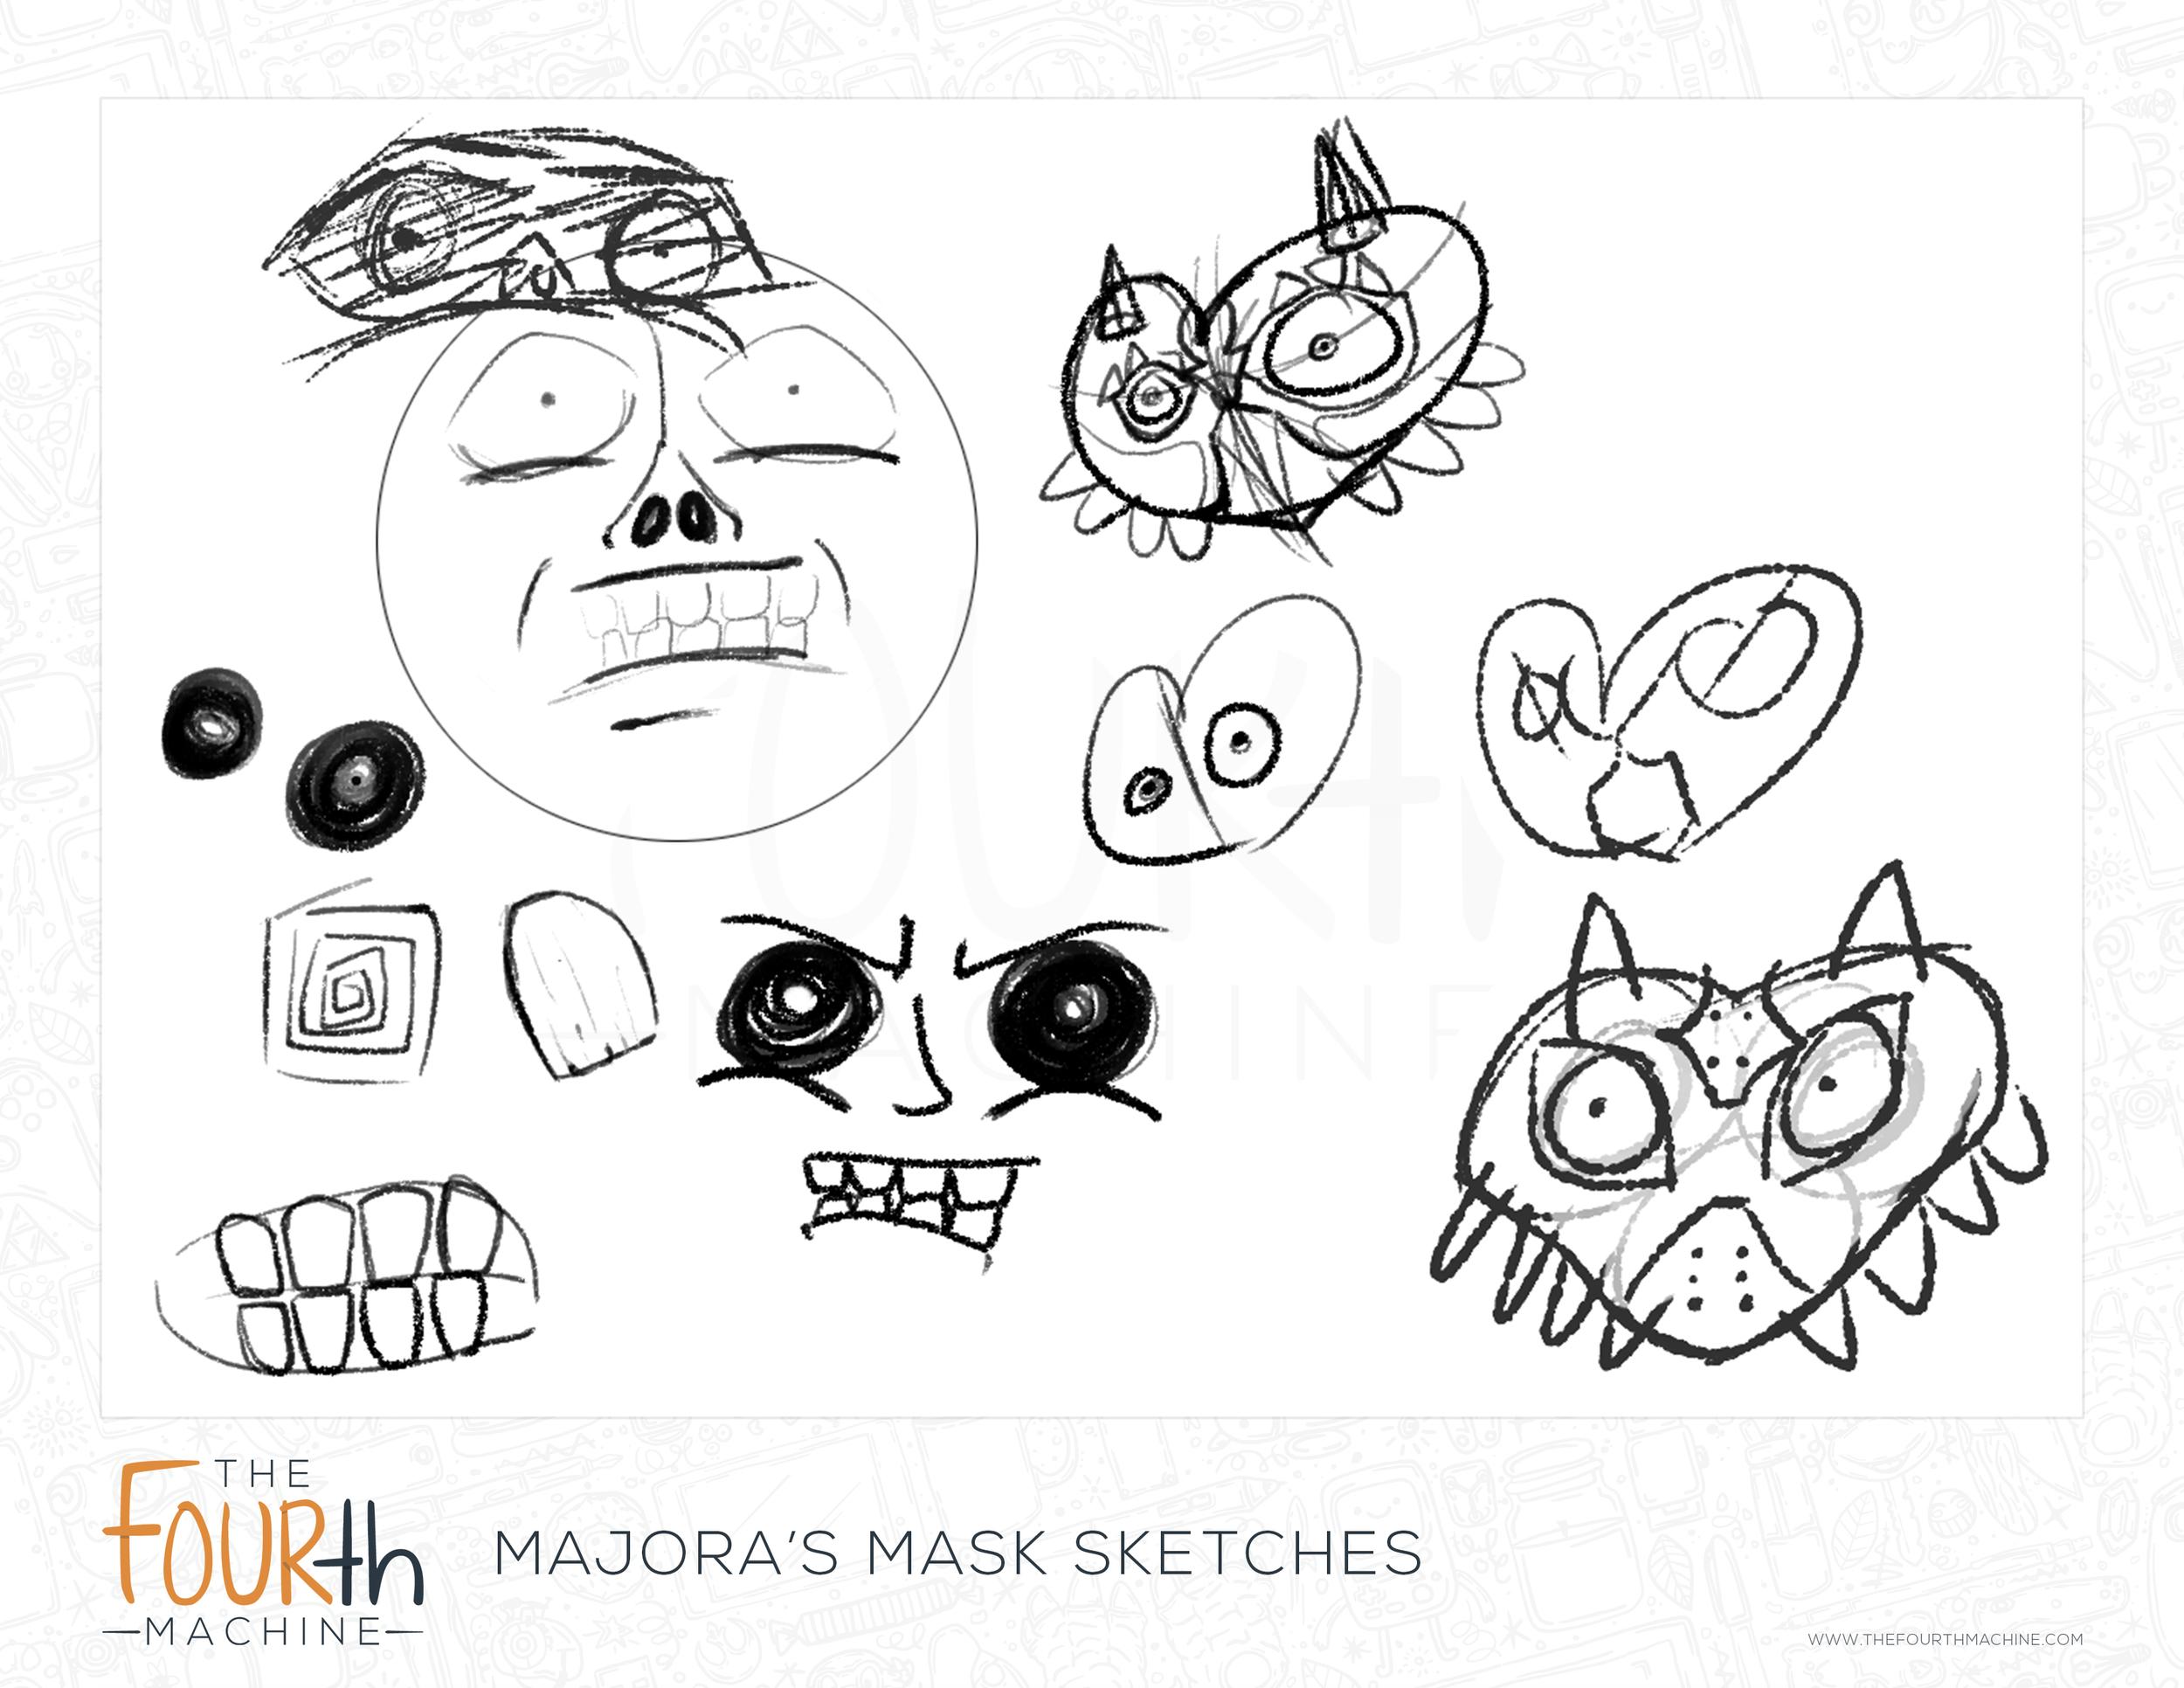 Majoras Mask Sketches.jpg